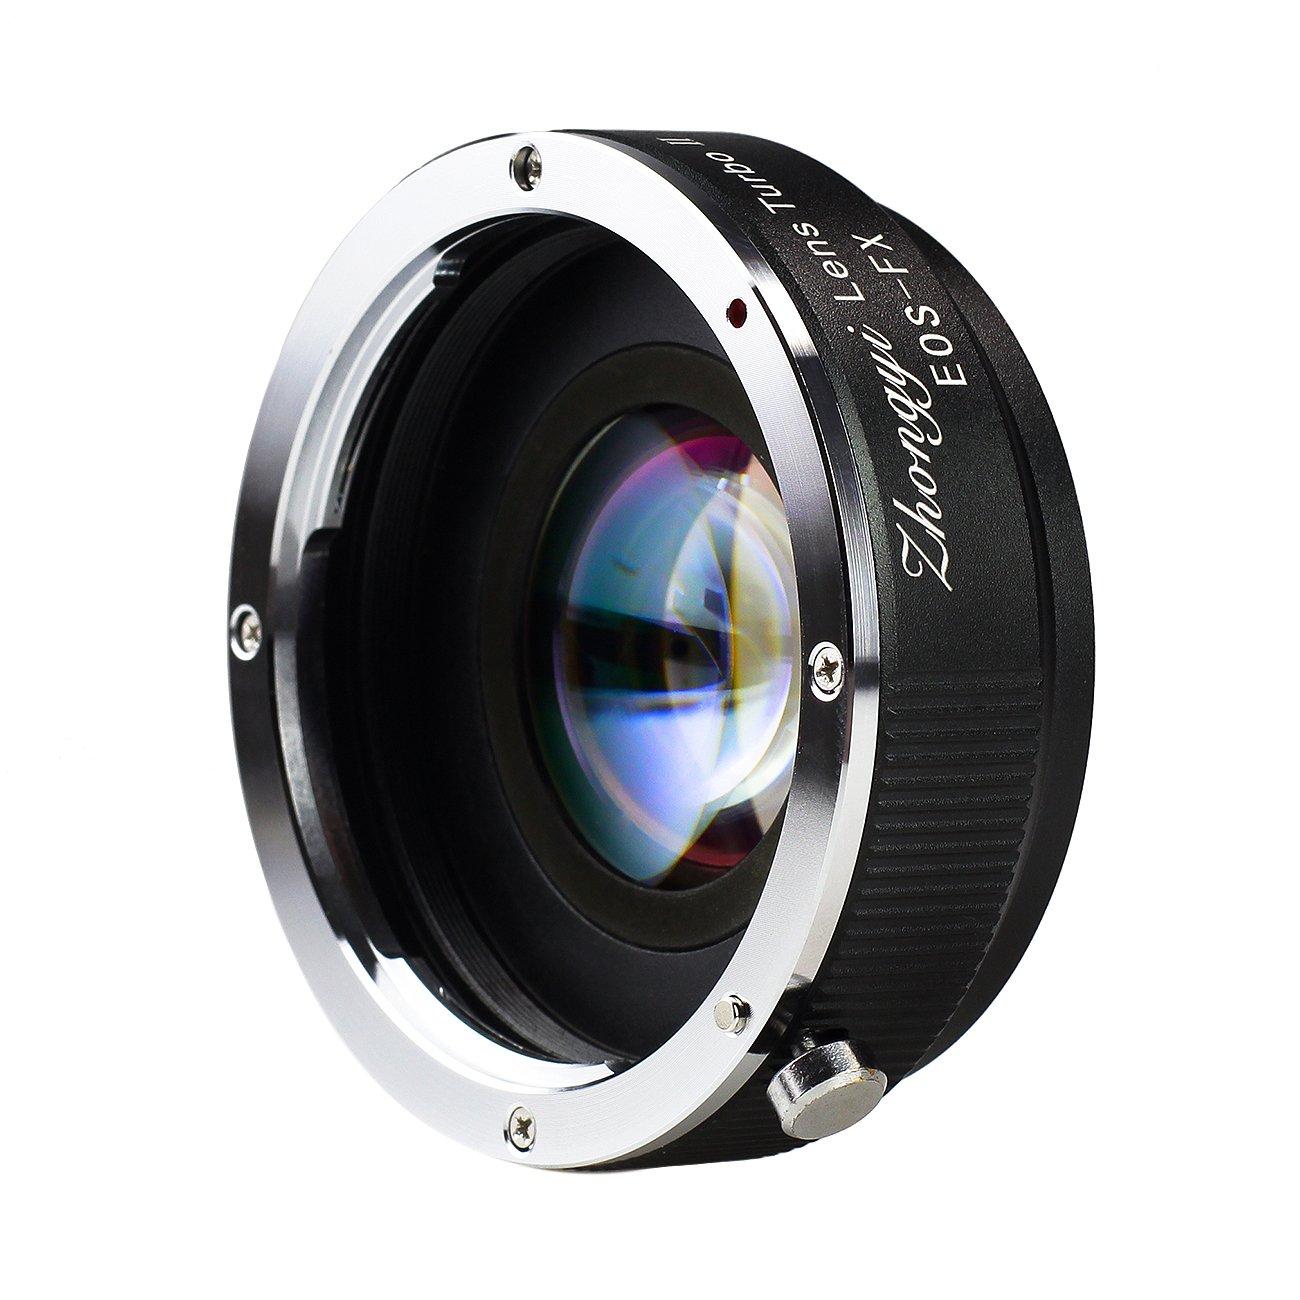 Zhongyi Adaptador de lentes de Turbo II para la lente de la cámara Canon EF Fuji FX como Fuji Pro1 X-E1 X-E2 X-M1-A2 A1-X X-T1: Amazon.es: Electrónica